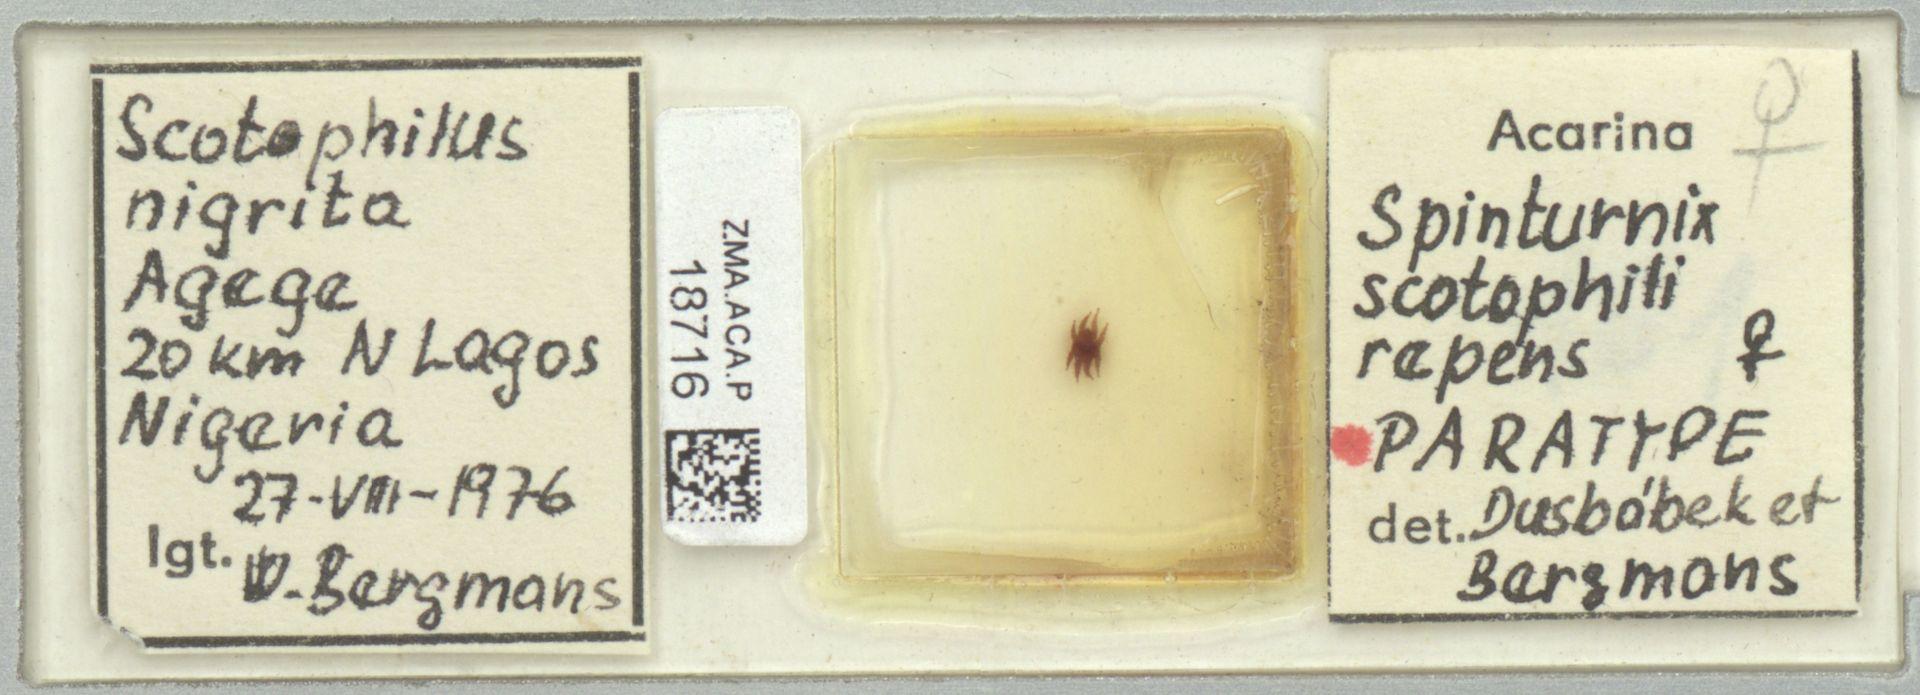 ZMA.ACA.P.18716 | Spinturnix scotophili repens